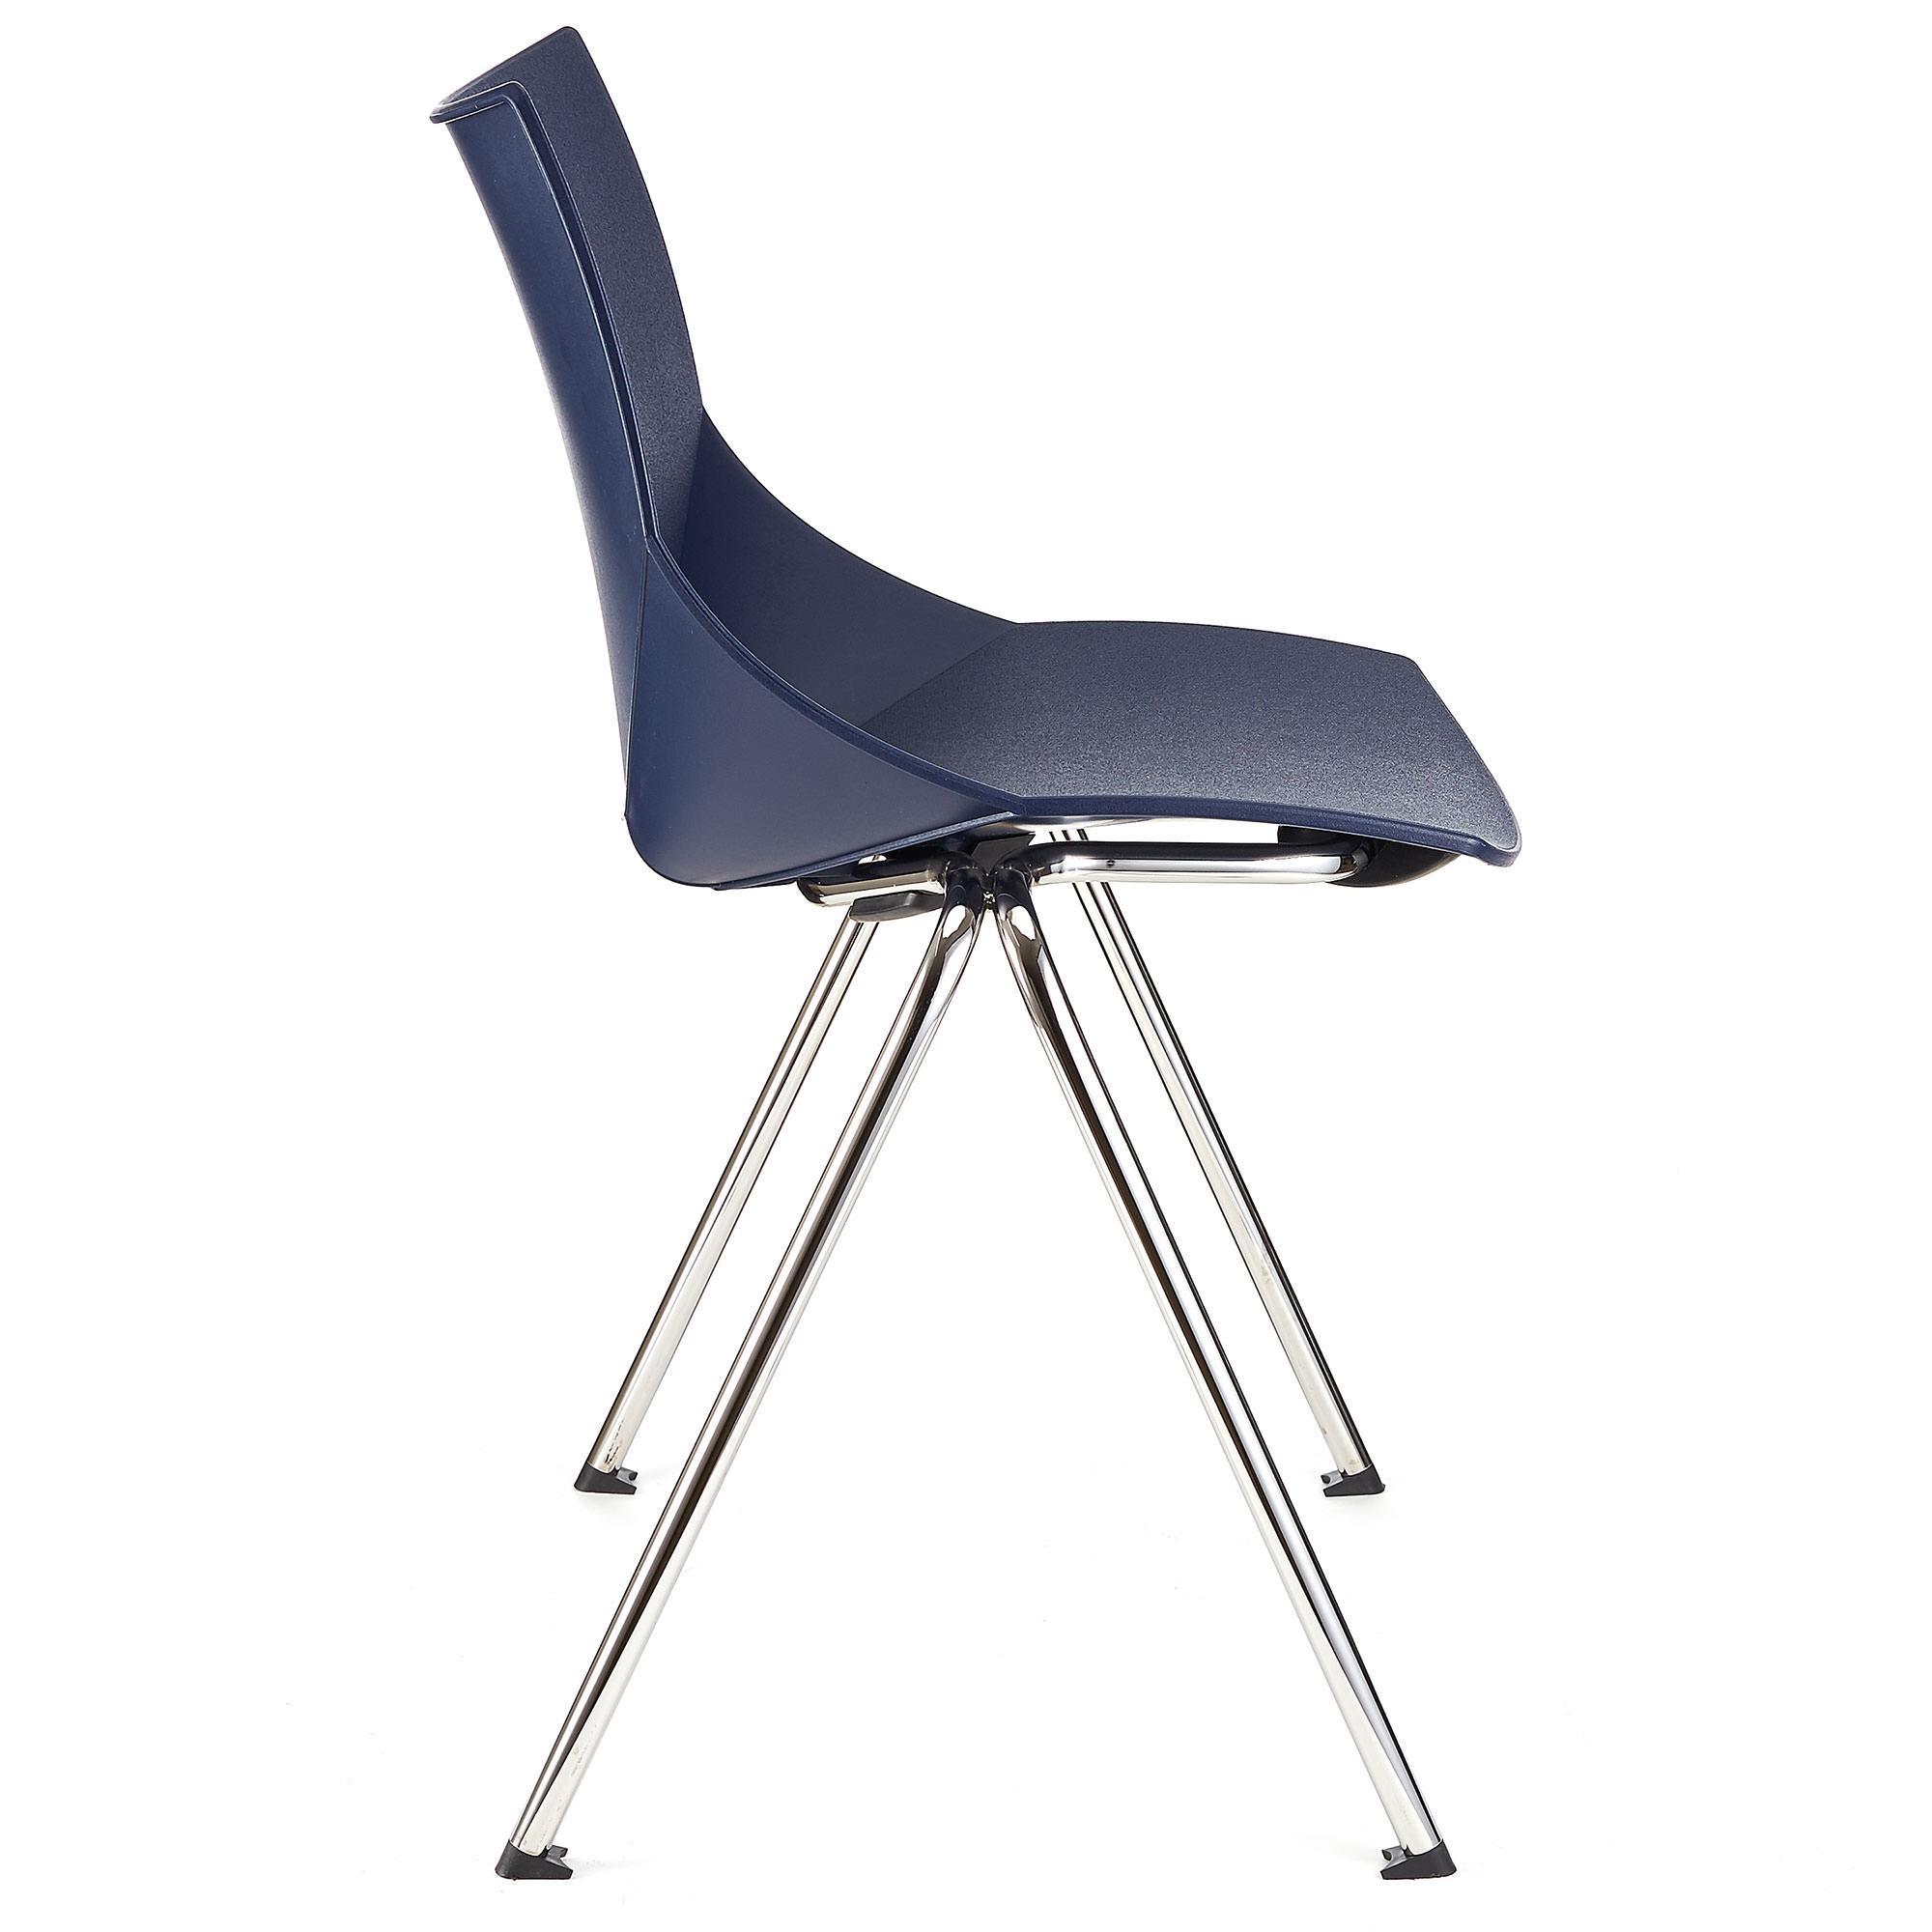 Sedia sala d 39 attesa amir impilabile colore blu sedia for Sedia per sala d attesa